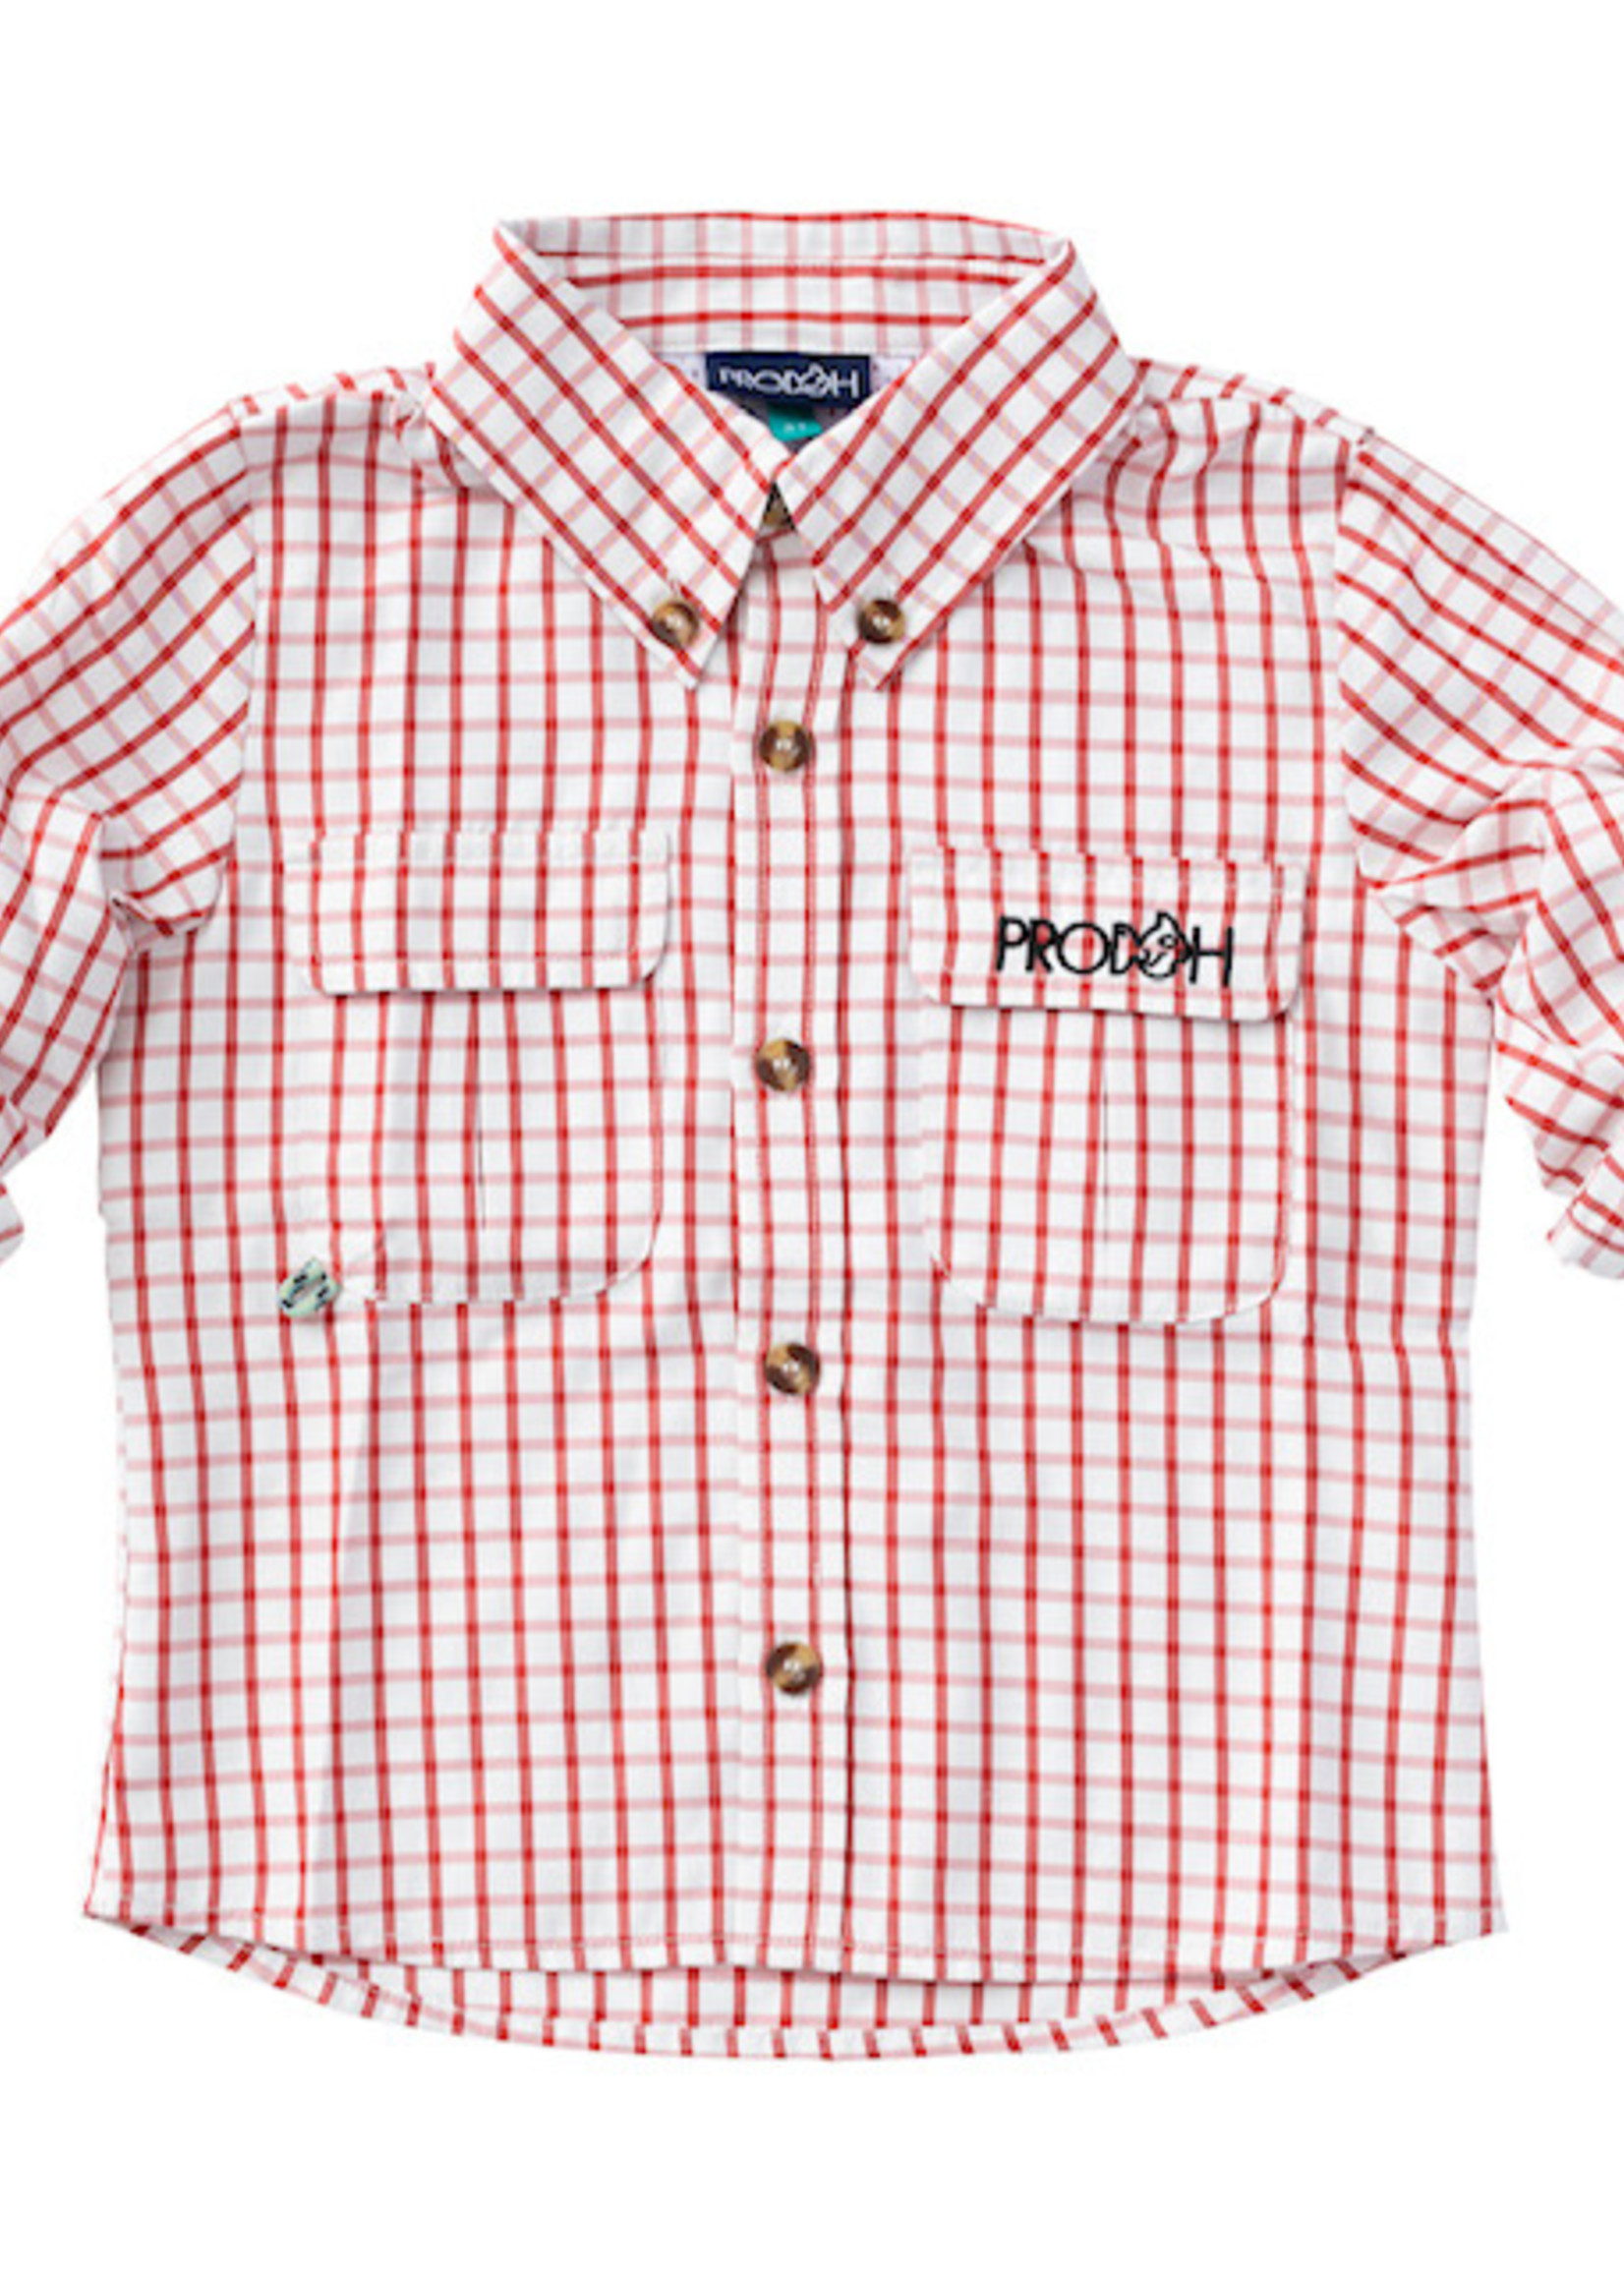 Gameday Fishing Shirts - (red)